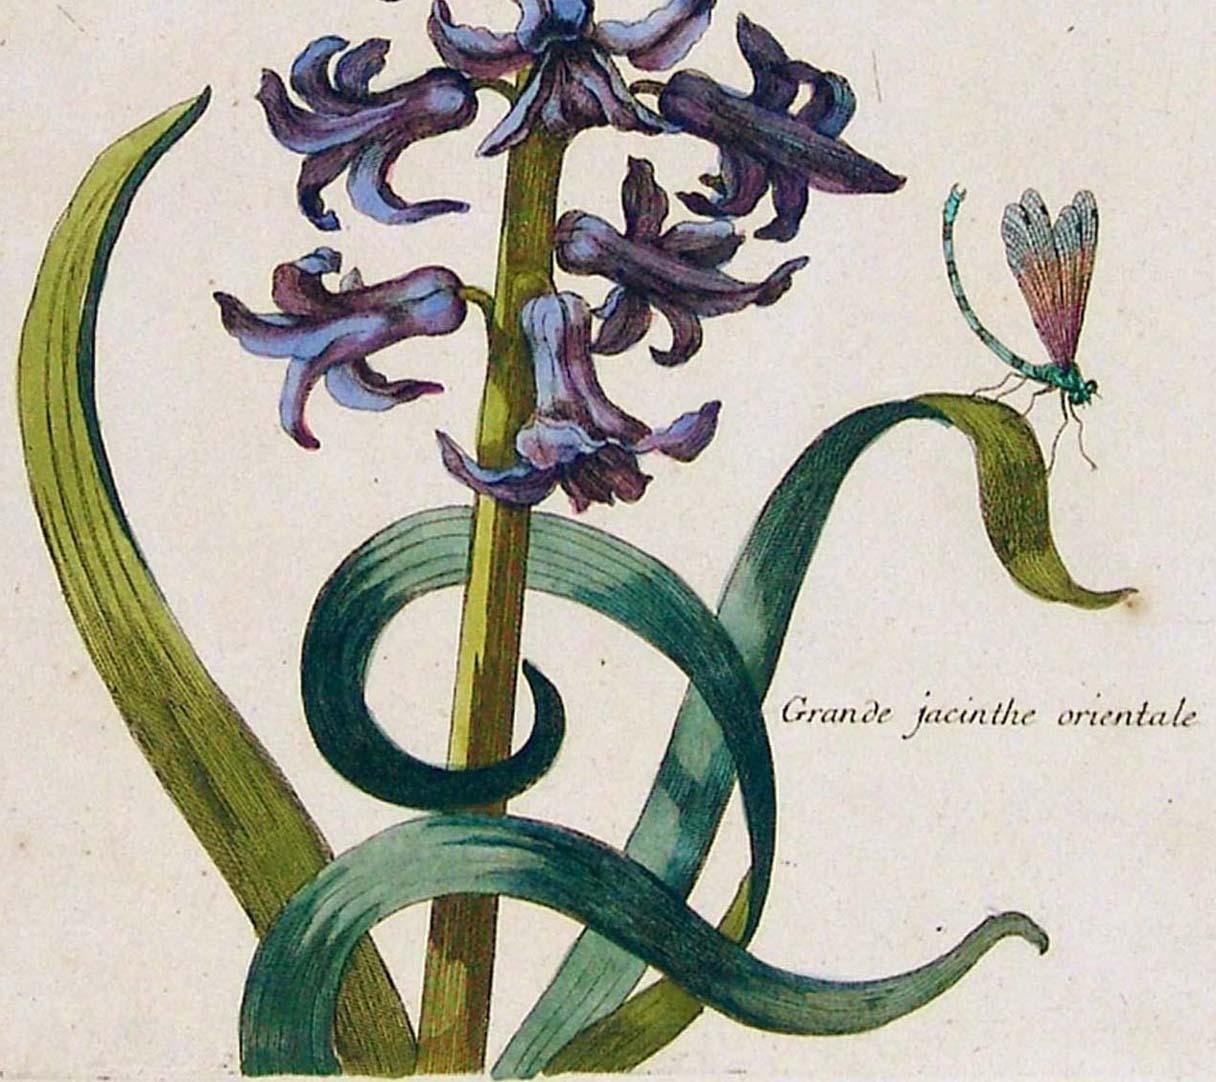 Grande jacinthe orientale untere Blatthälfte